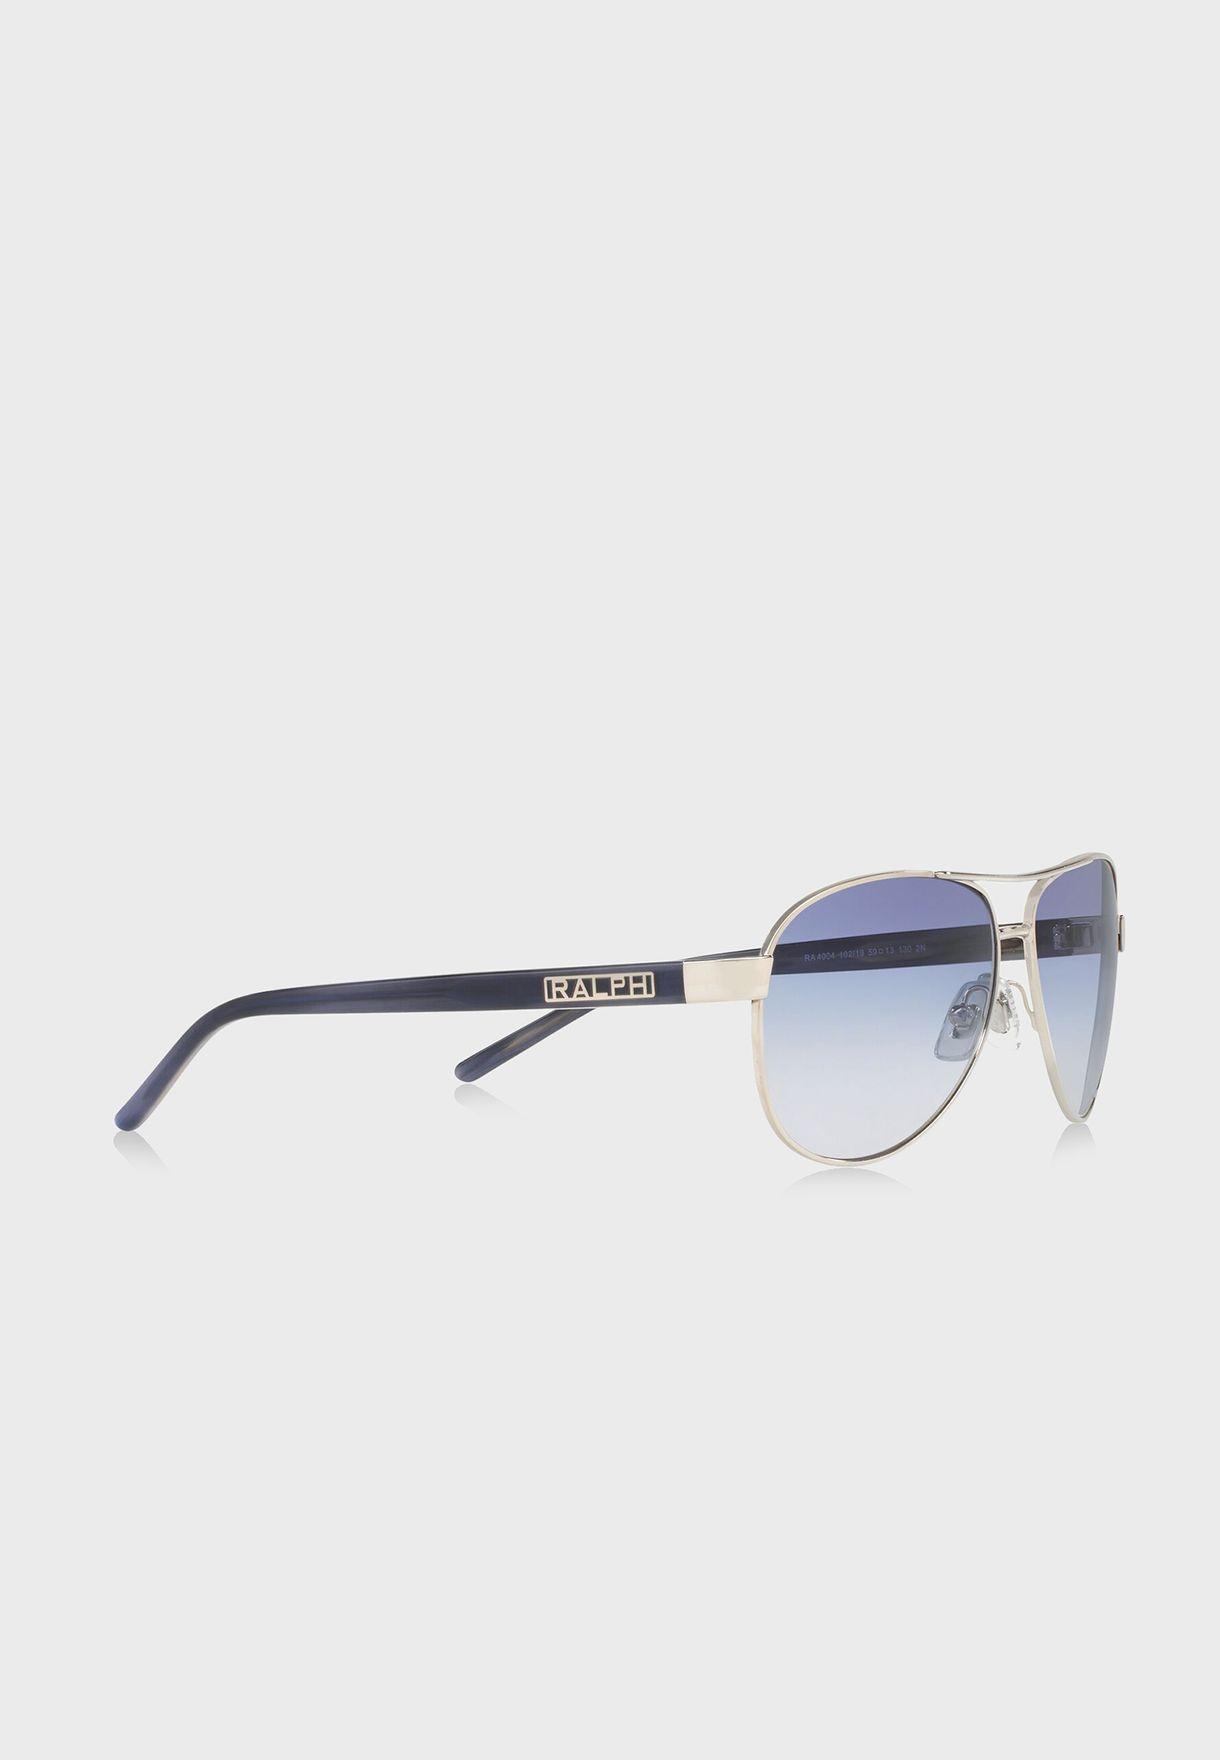 378dfbee2e0 Shop Polo Ralph Lauren silver Aviator Sunglasses 8.05E+11 for ...